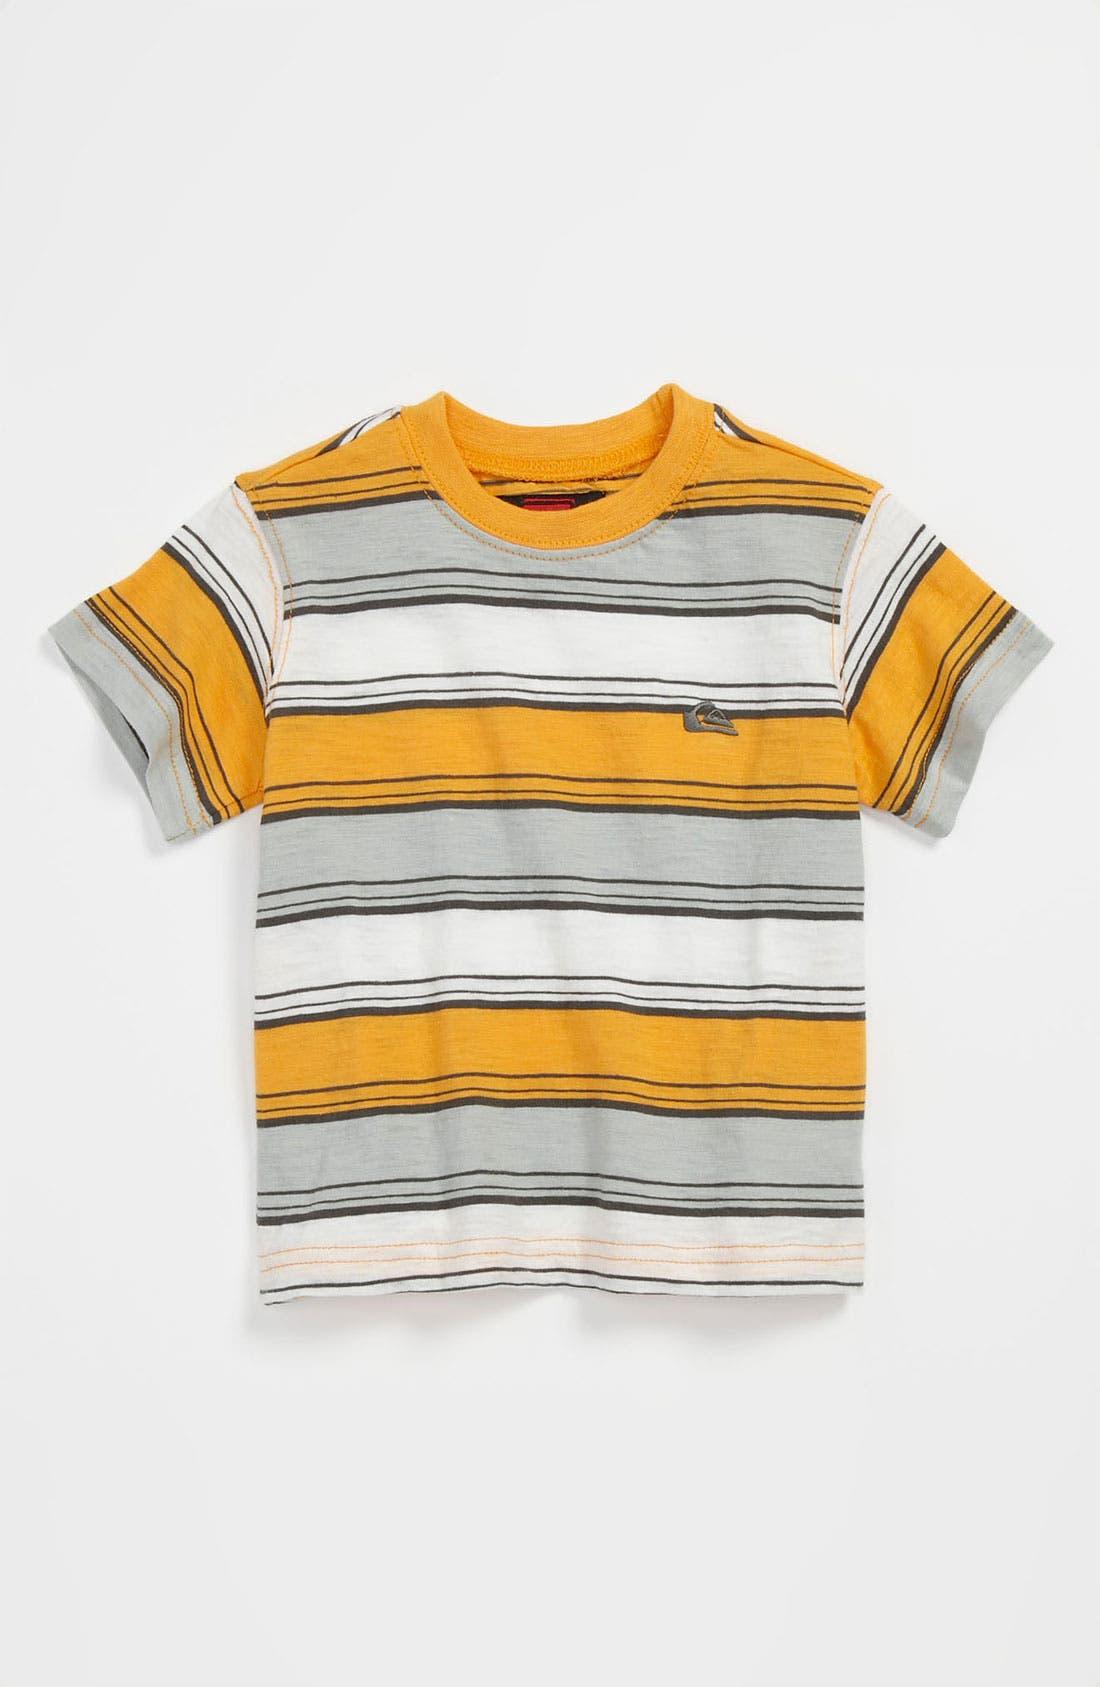 Main Image - Quiksilver 'Downside' Stripe Shirt (Baby)